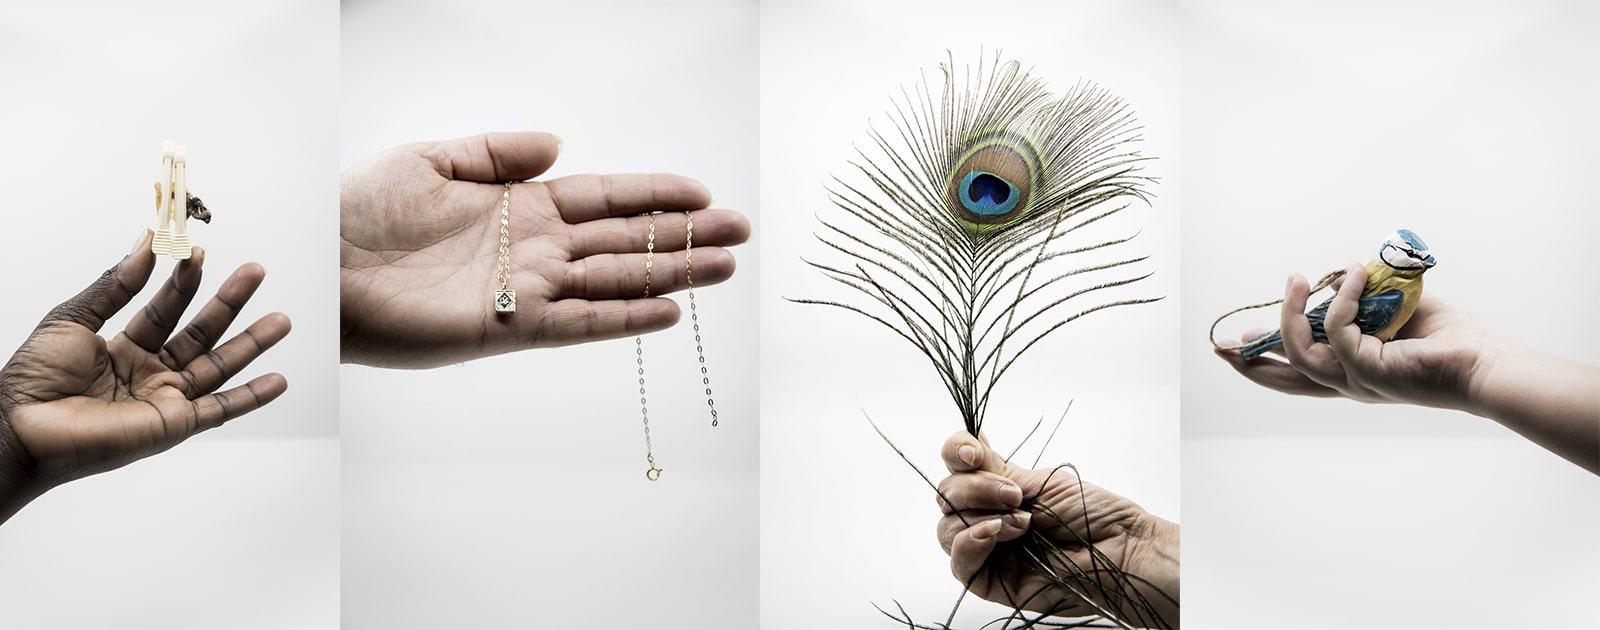 «La vie des objets»